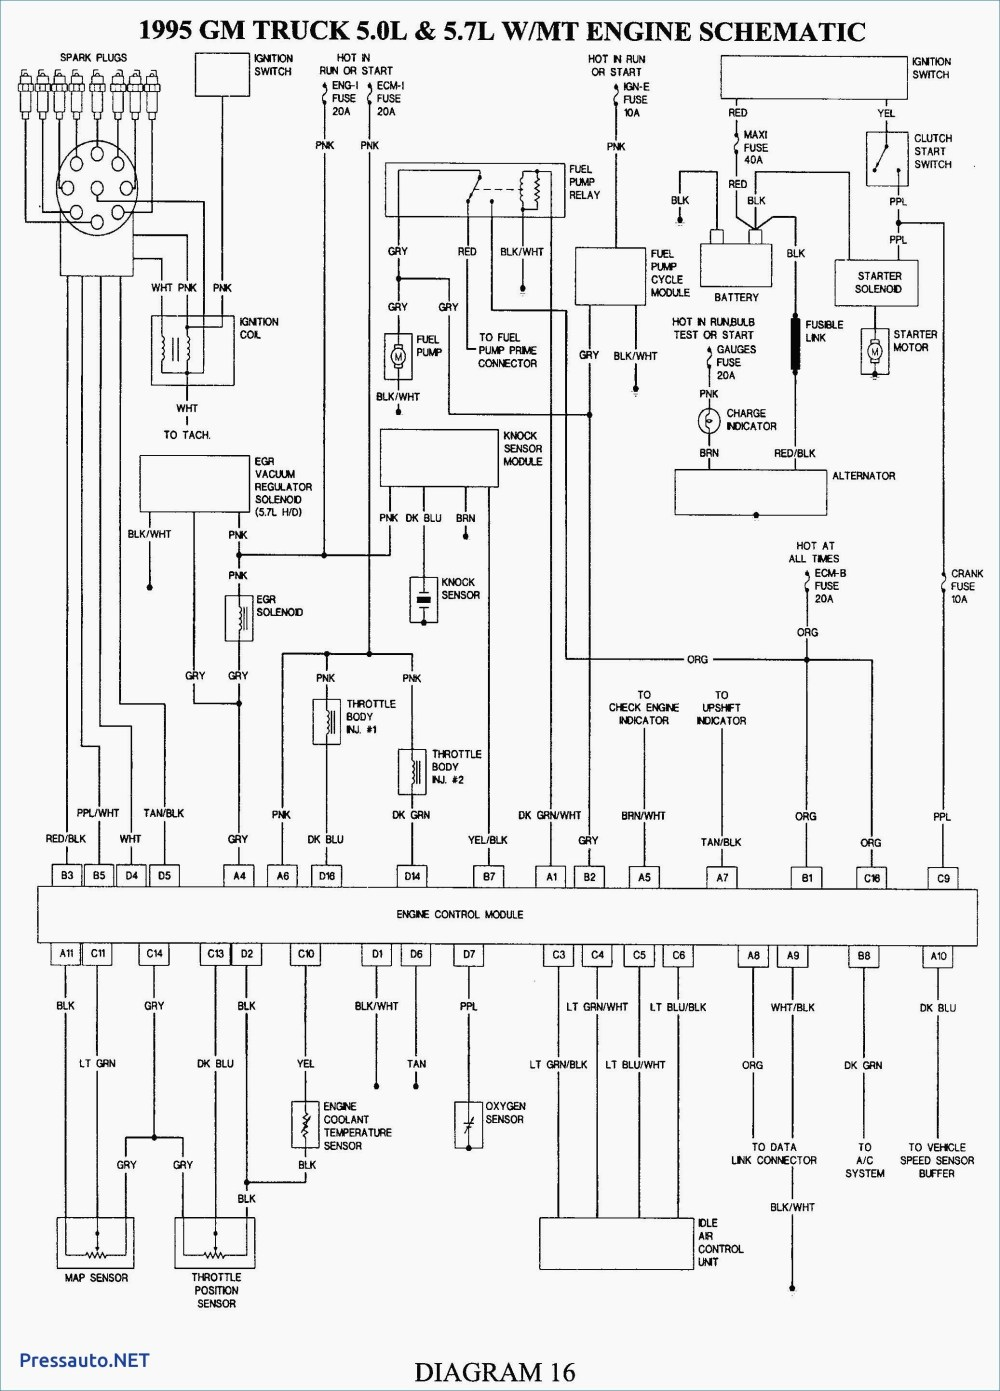 medium resolution of 1995 mack truck wire diagrams wiring library rh 98 akszer eu gm factory wiring diagram cummins